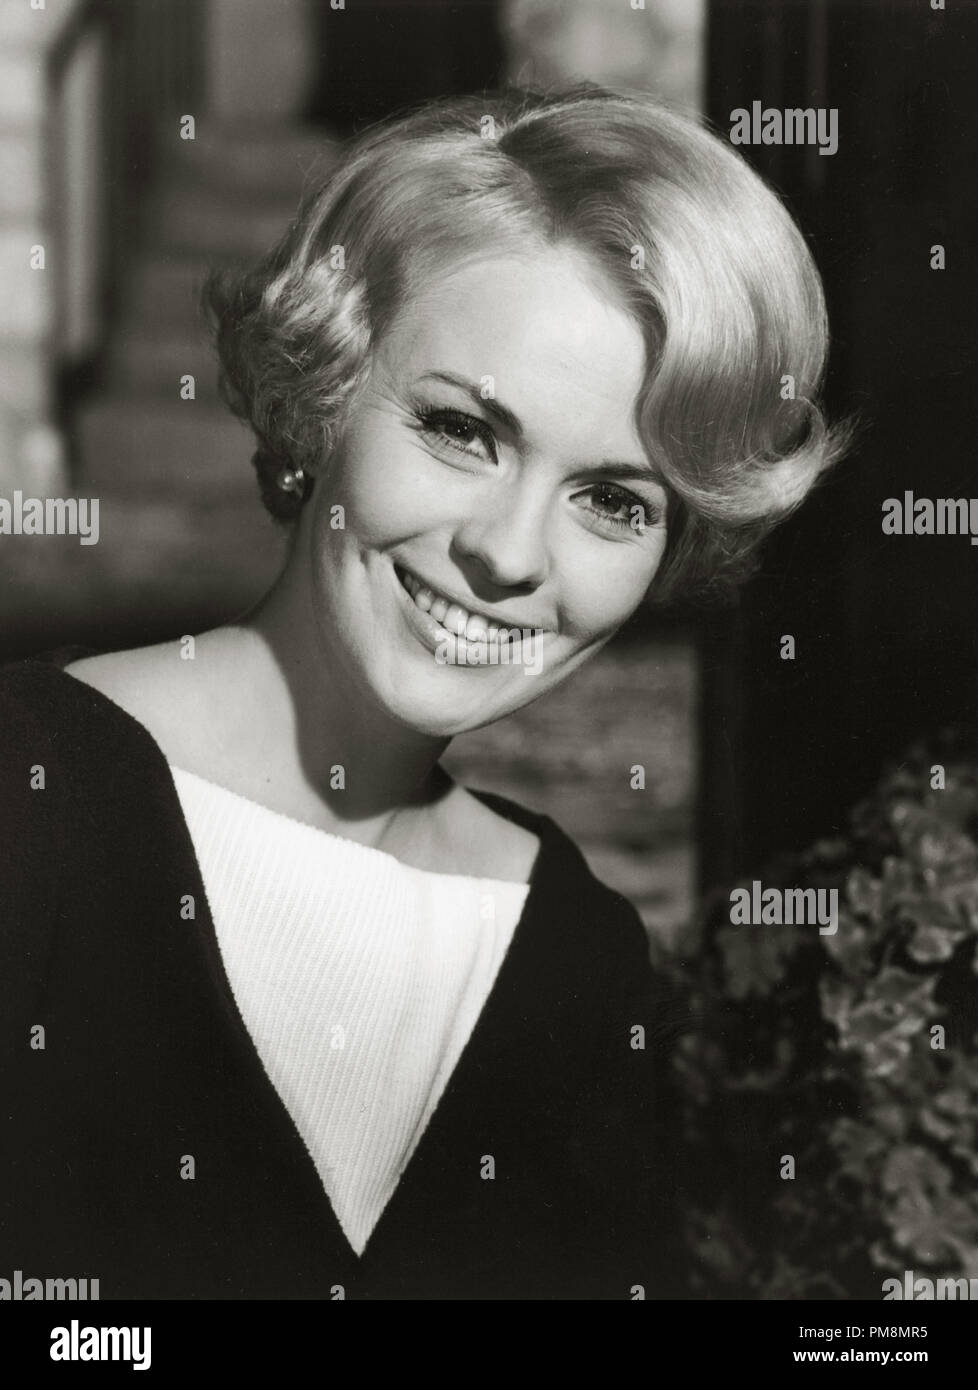 (Archival Classic Cinema - Jean Seberg Retrospective) Jean Seberg,  circa 1965  File Reference # 31664_004THA - Stock Image